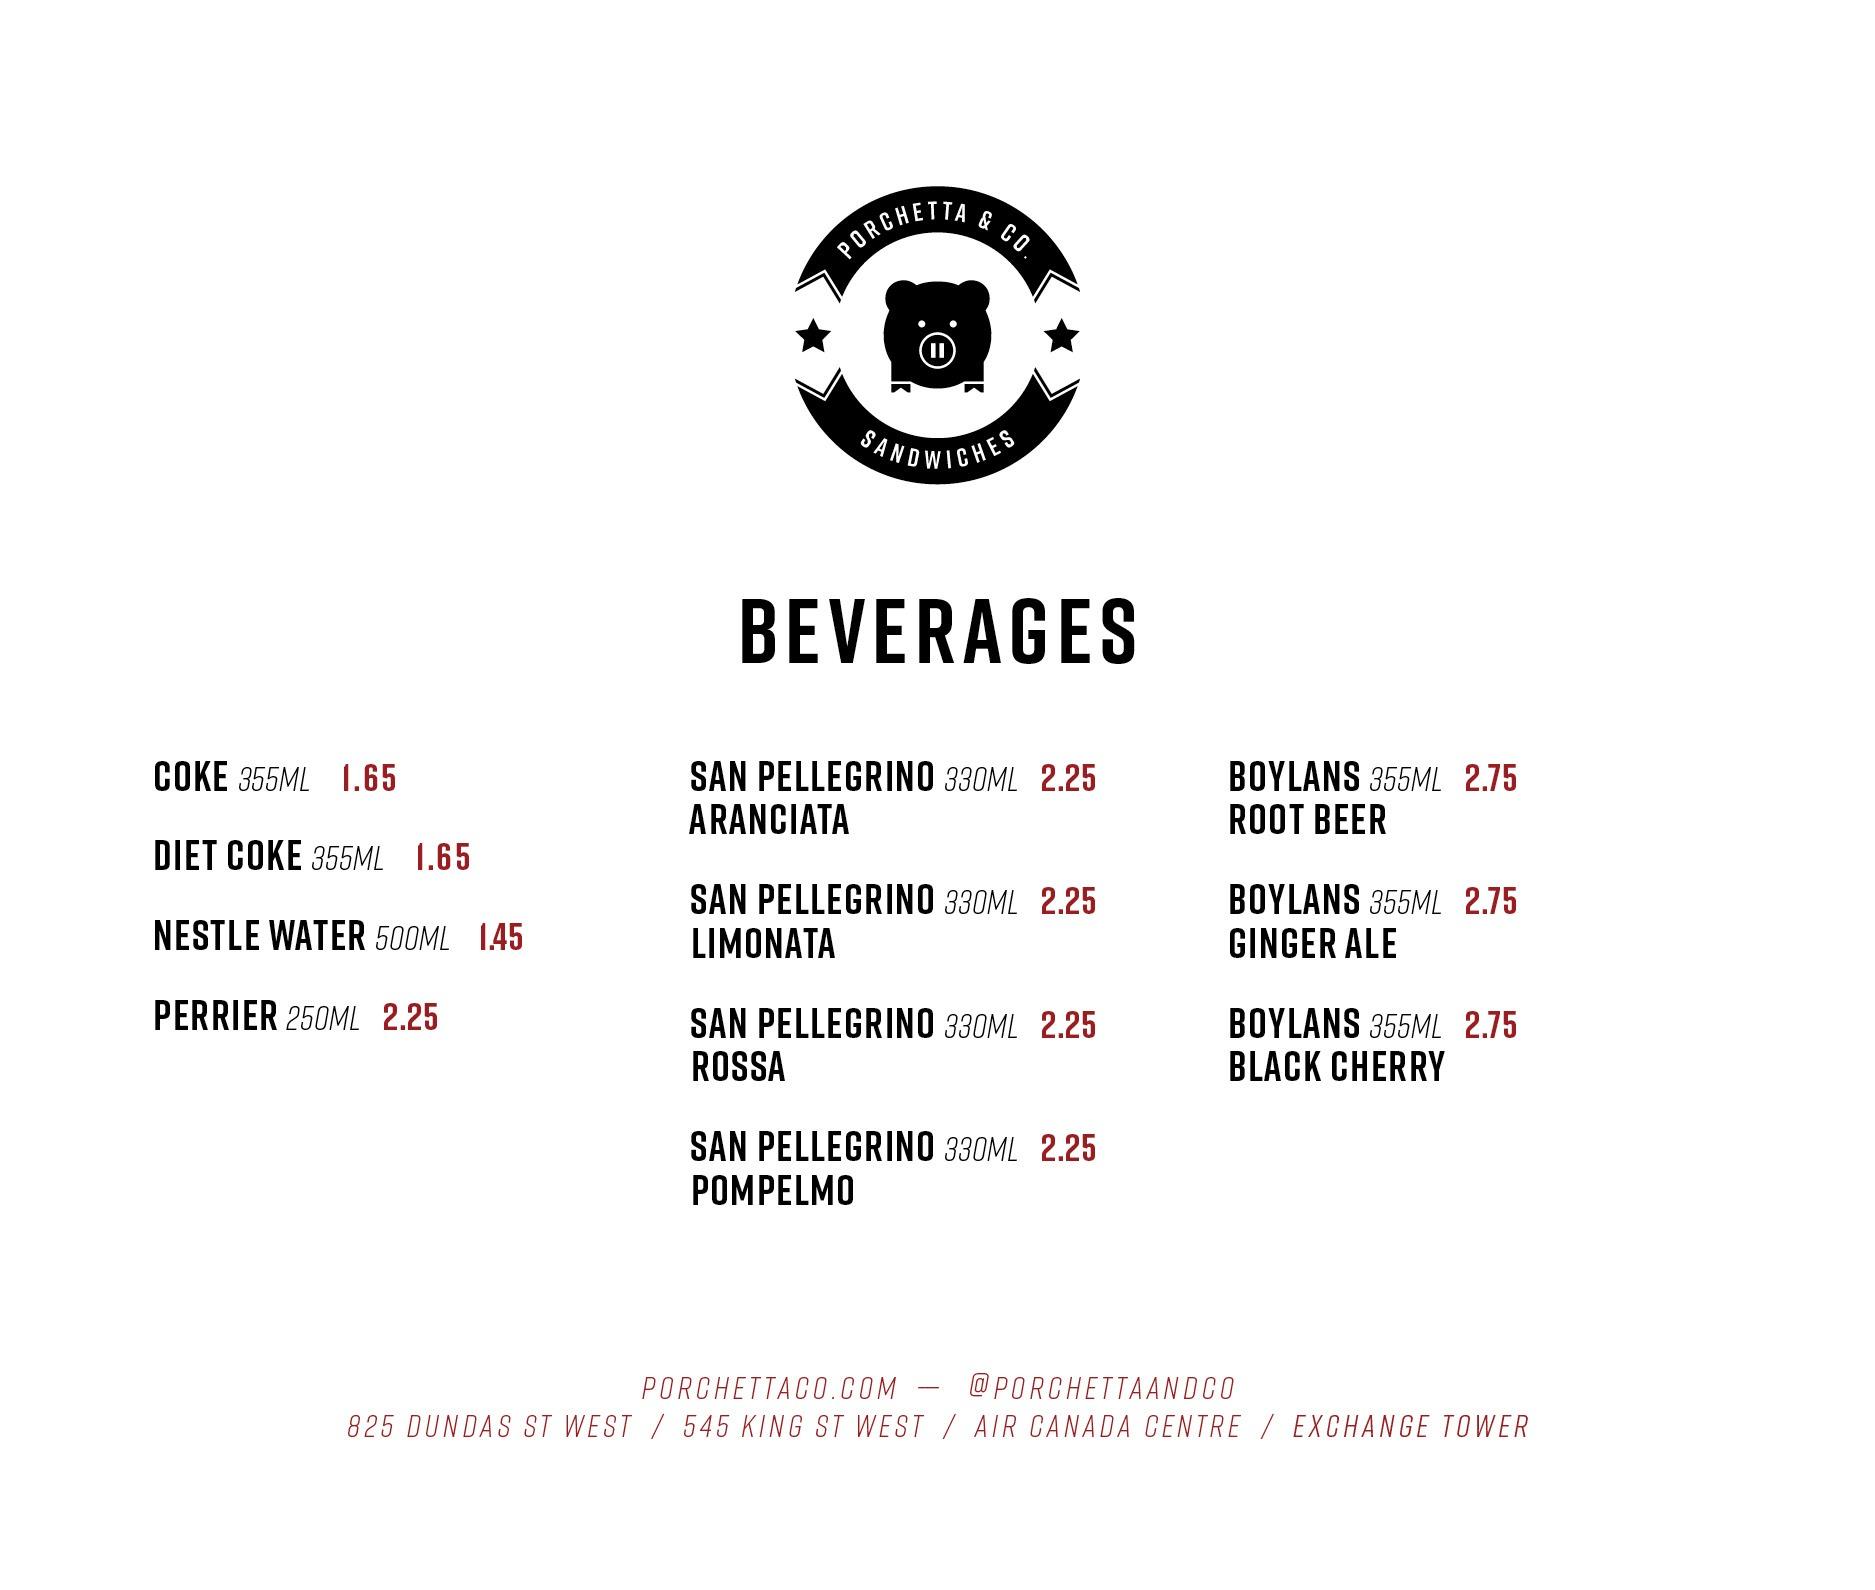 Dundas St West Beverages Menu